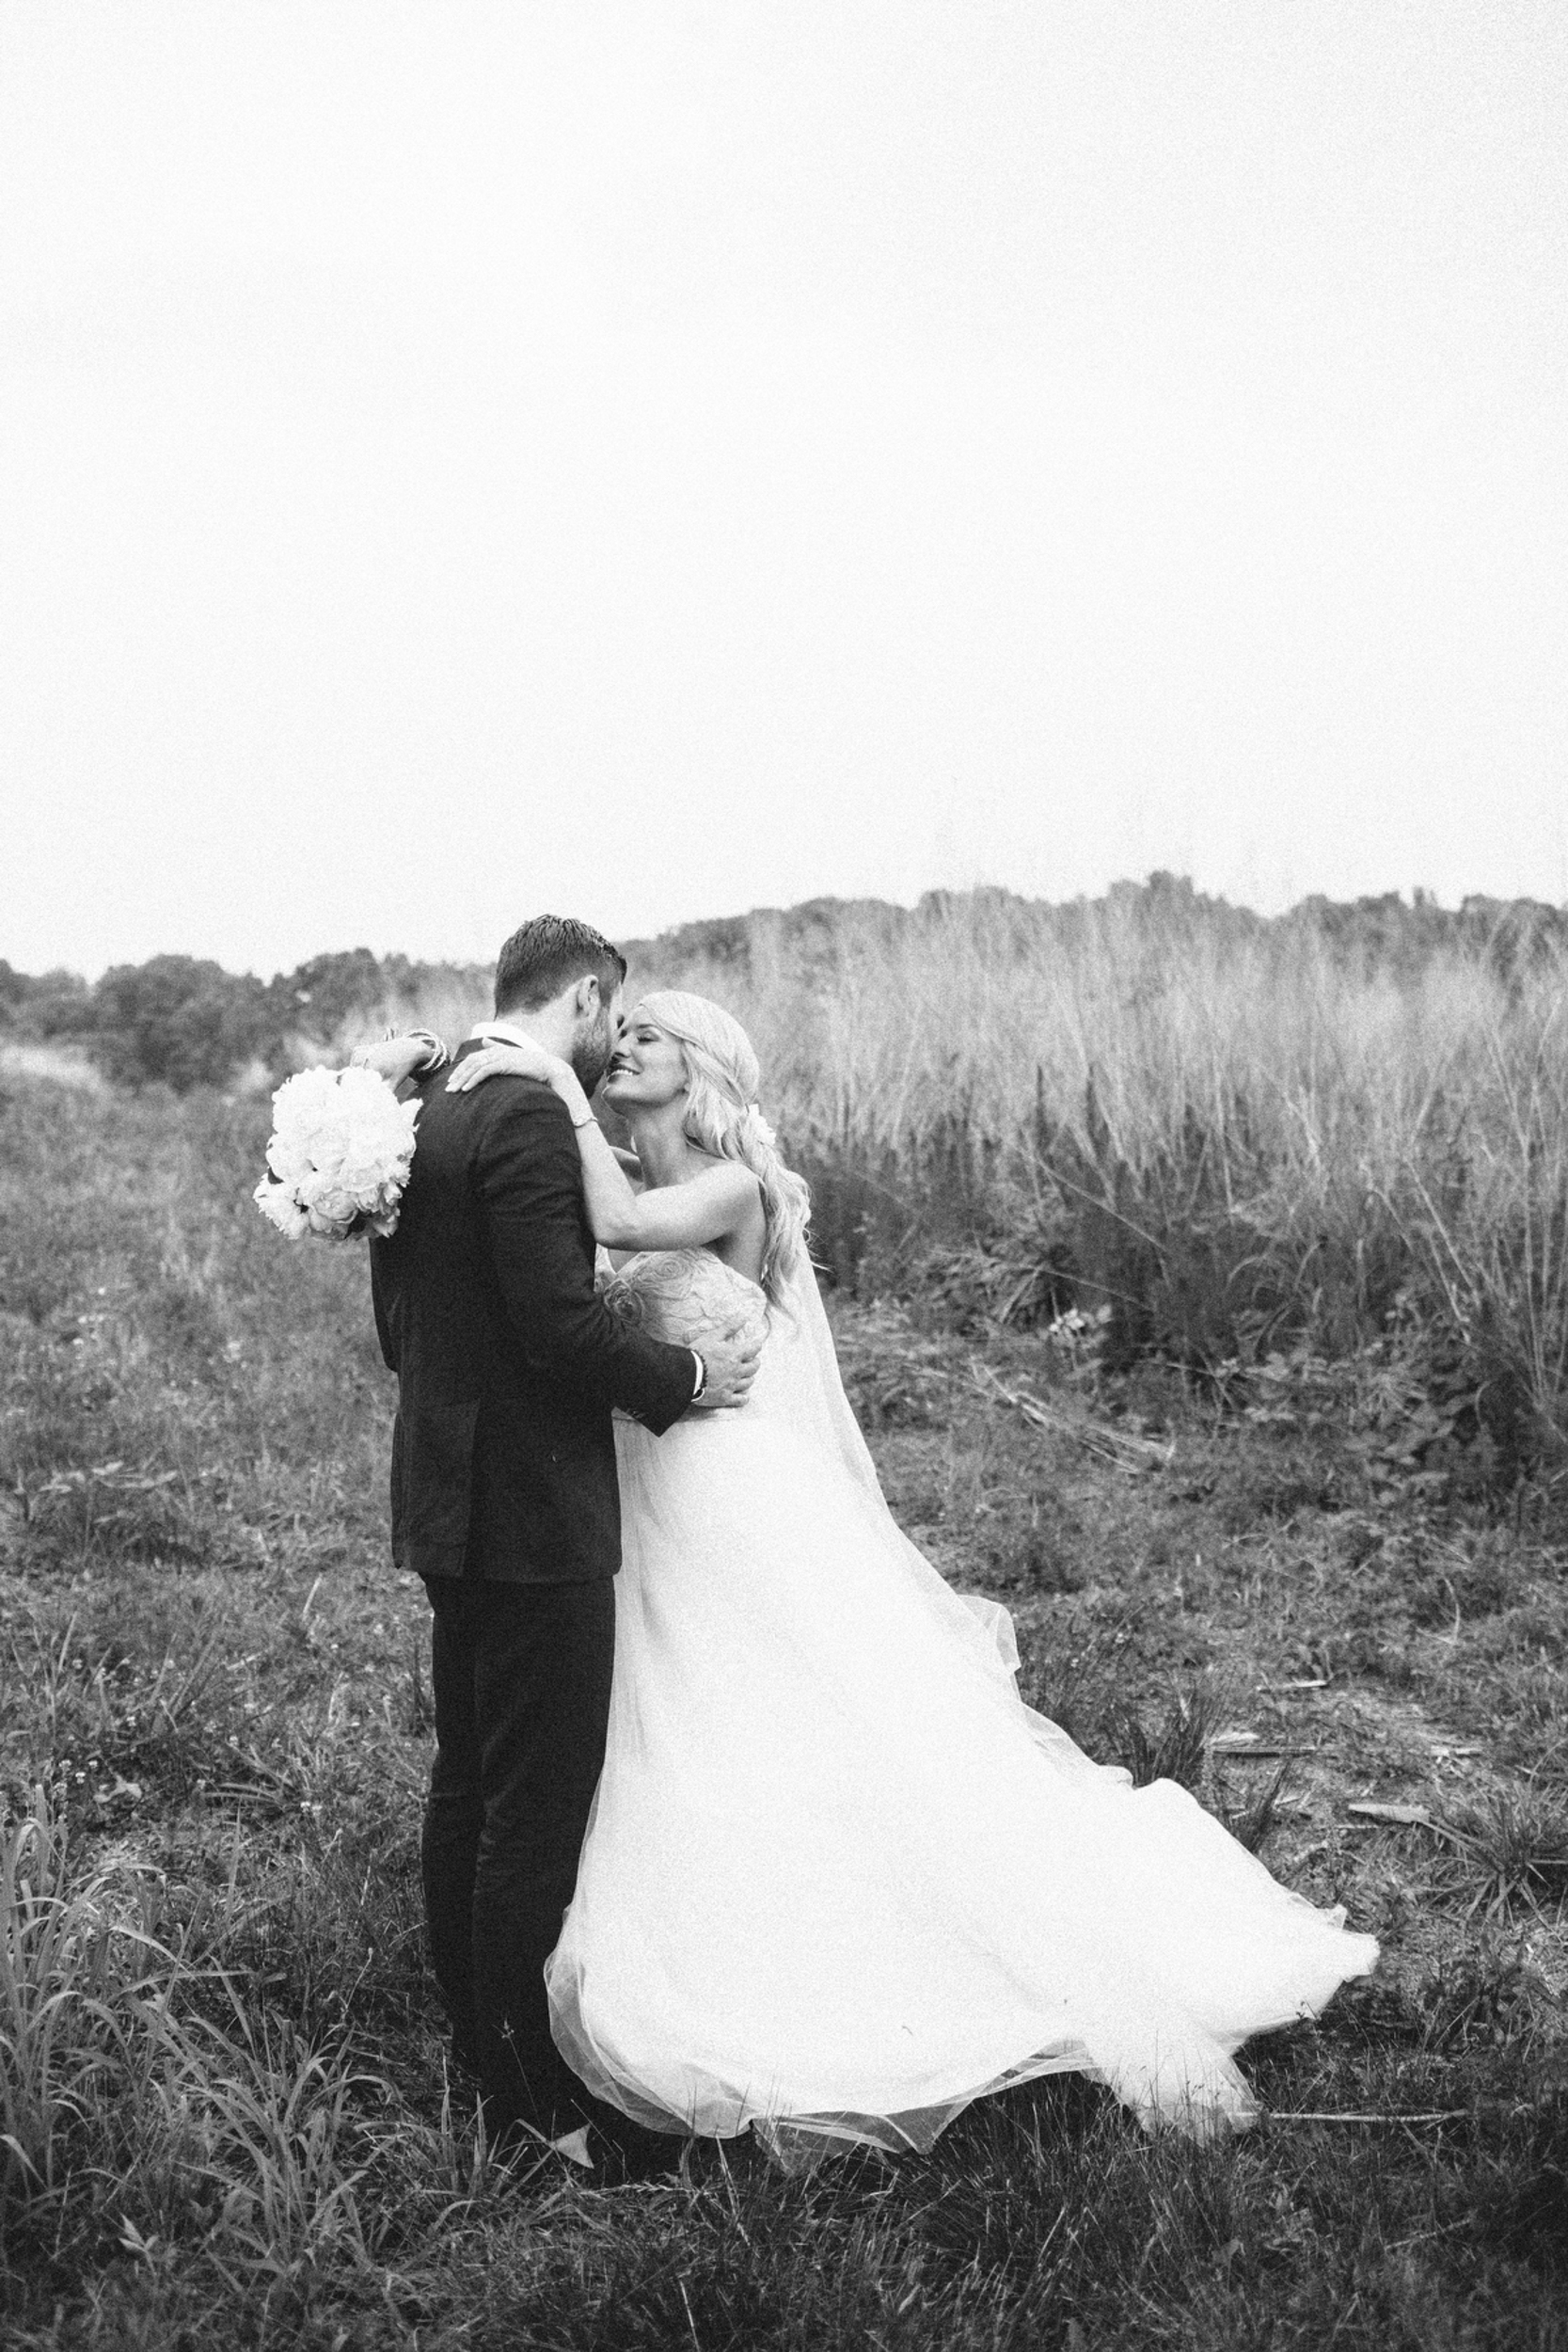 south_carolina_farm_wedding_rustic_chic_surprise_secret_luxe_wedding_bachelorette_emily_maynard_real_weddings-59.jpg